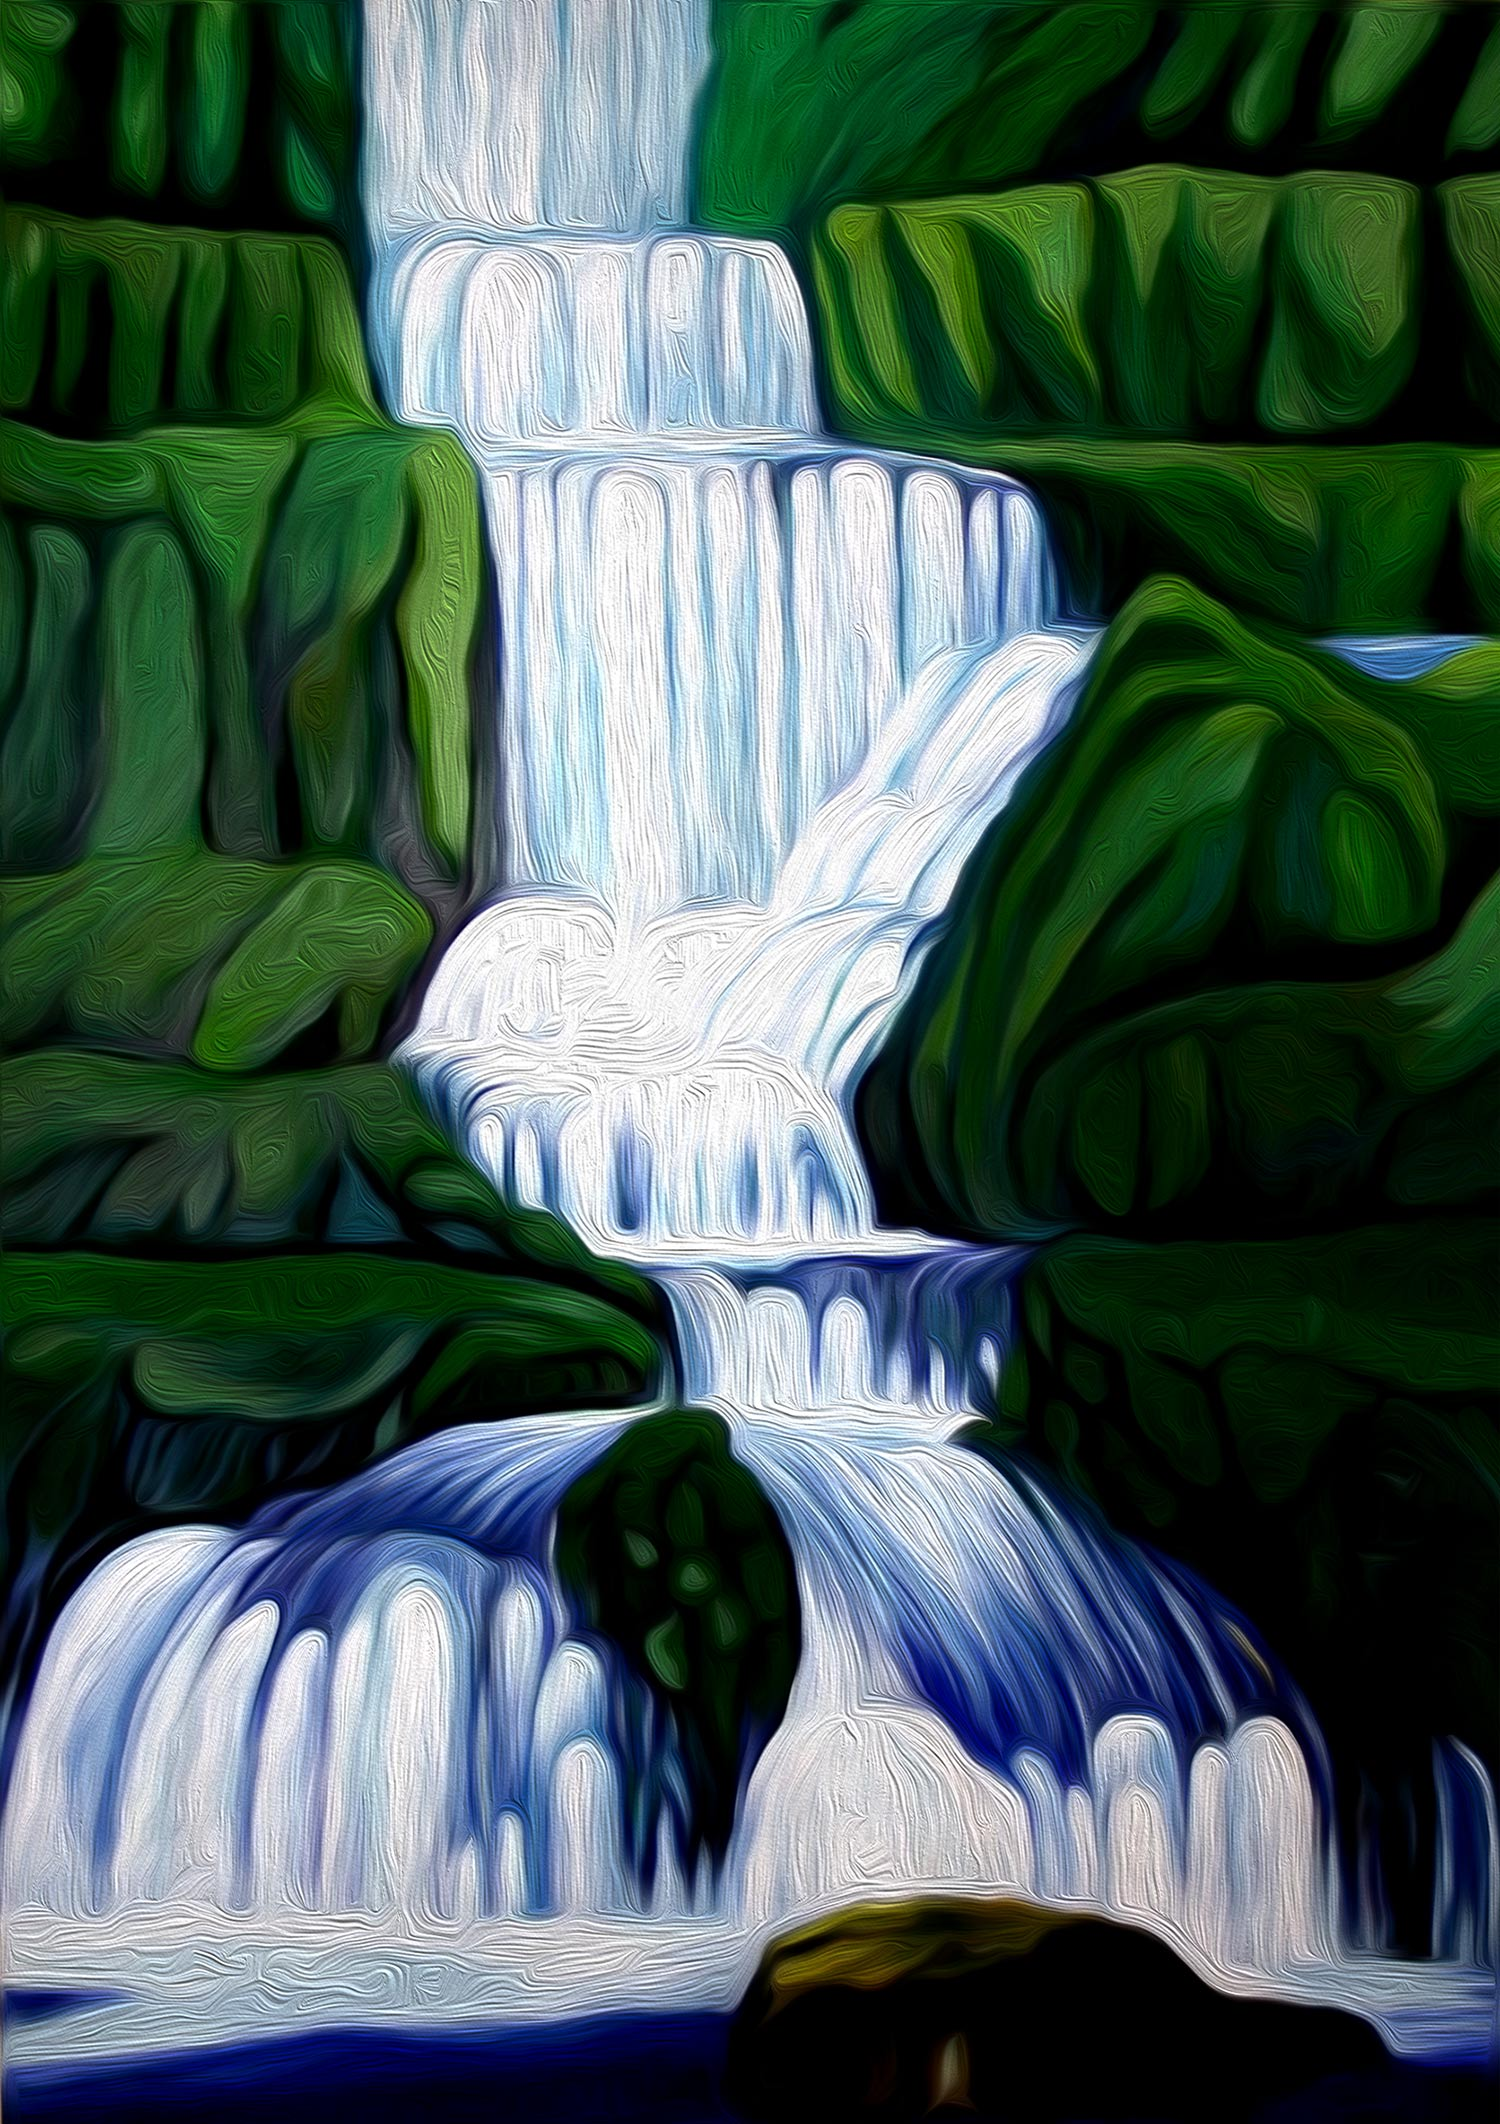 Ilustración gratis - Cascada de un río